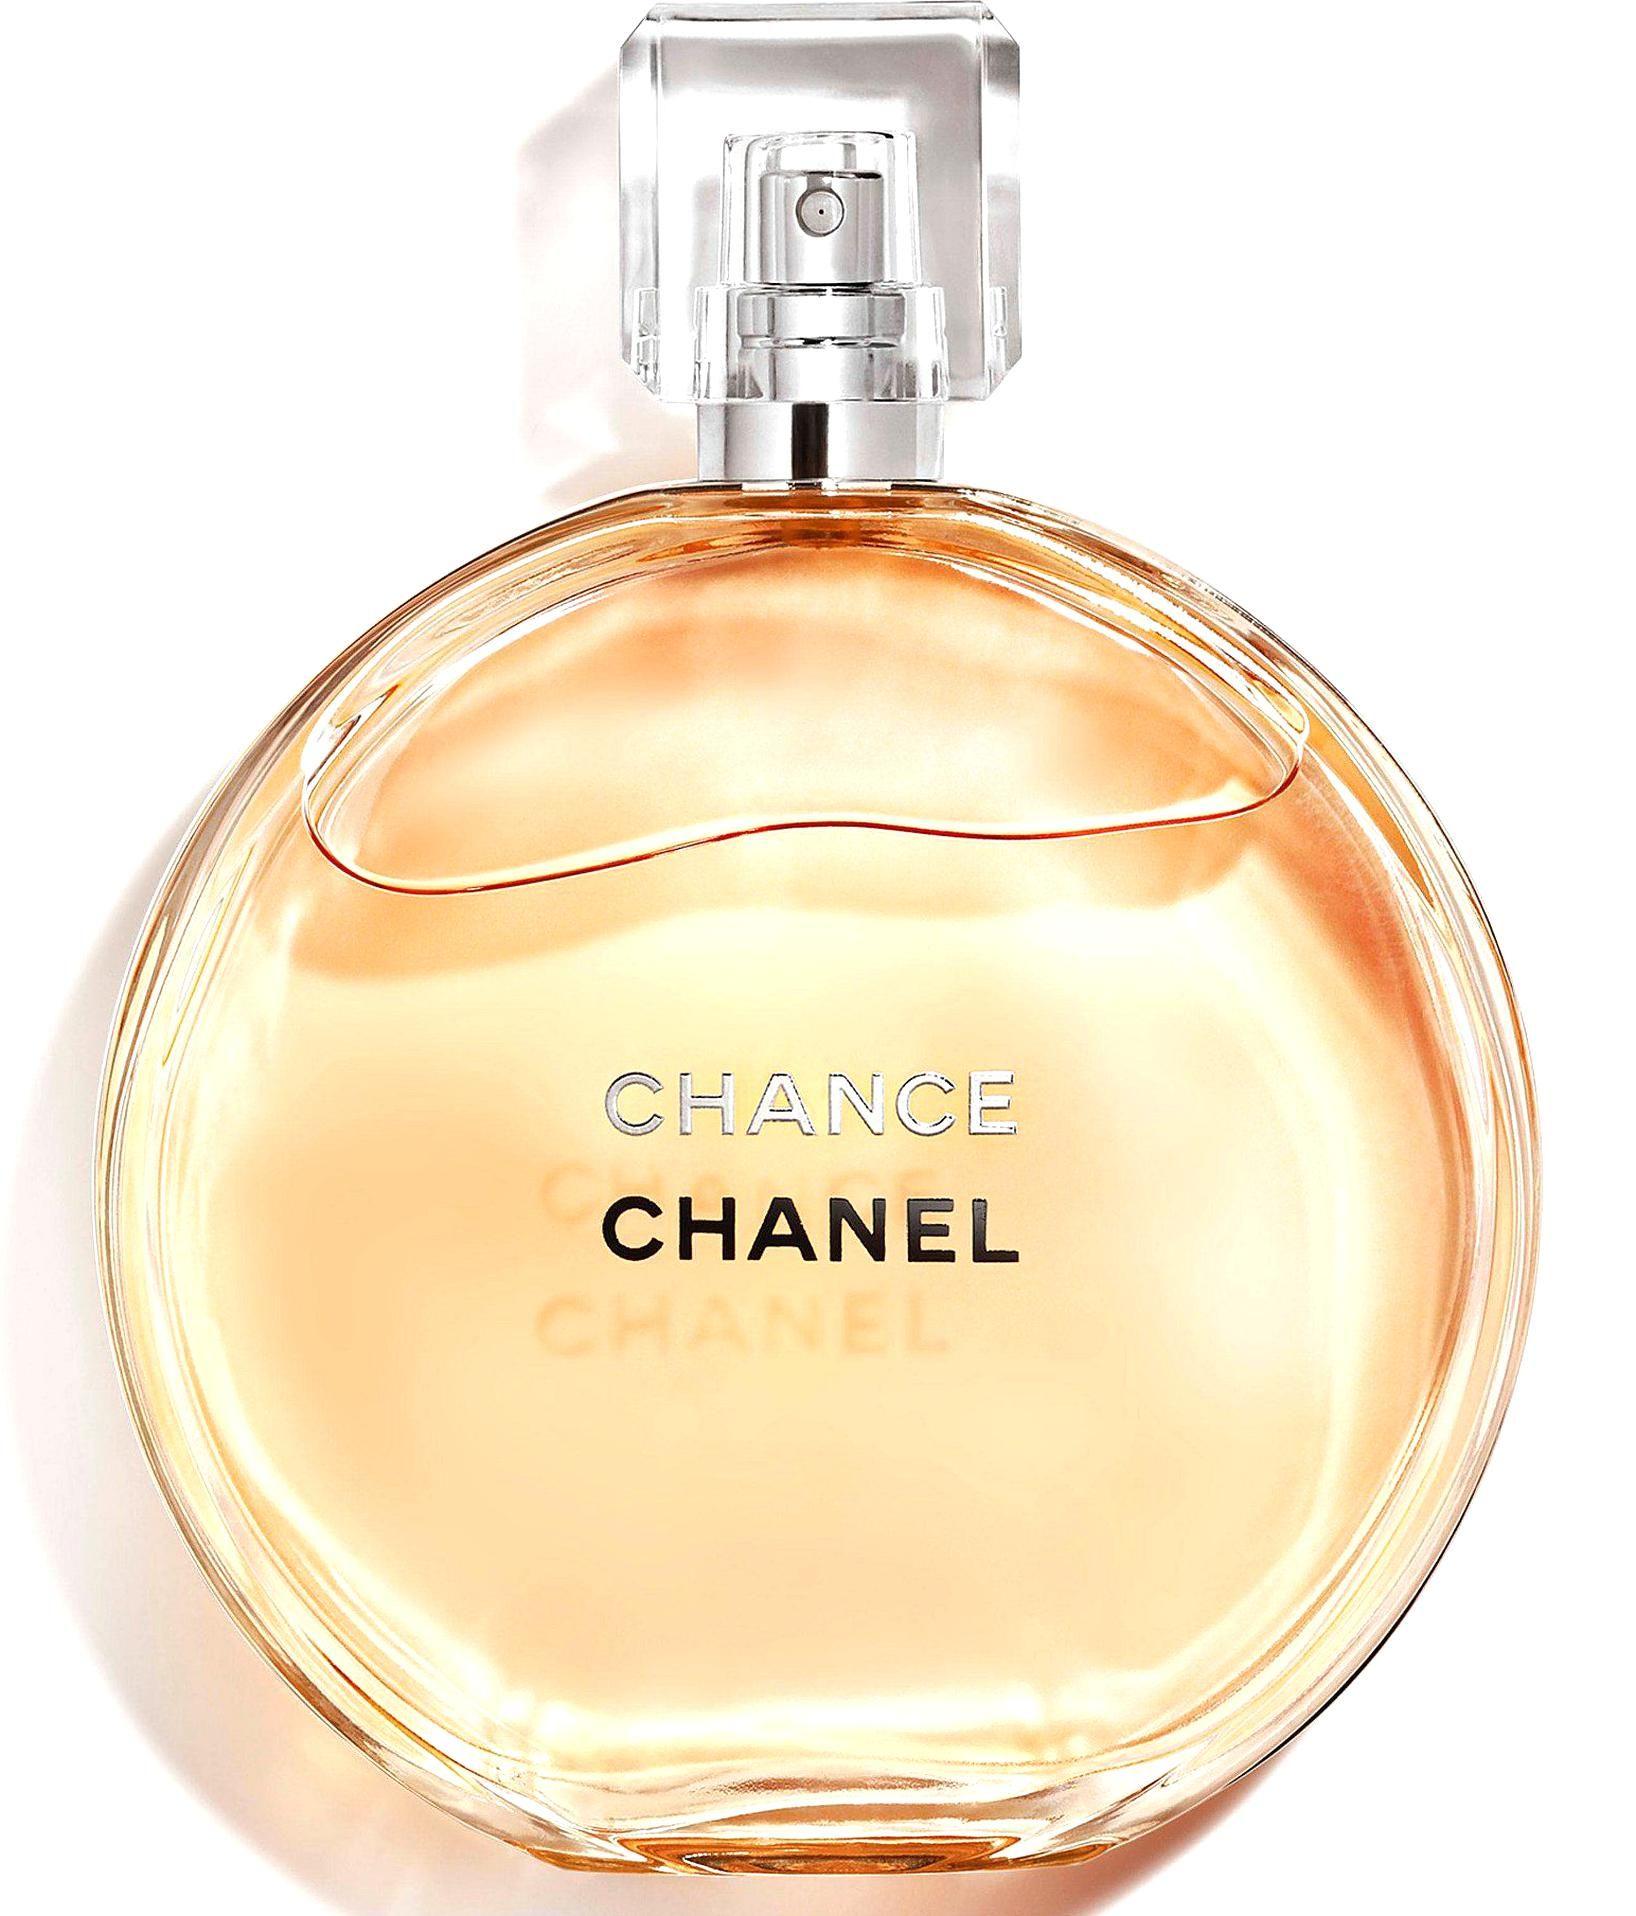 Best Value Perfumes, Body Care & Hair Care Bath & body